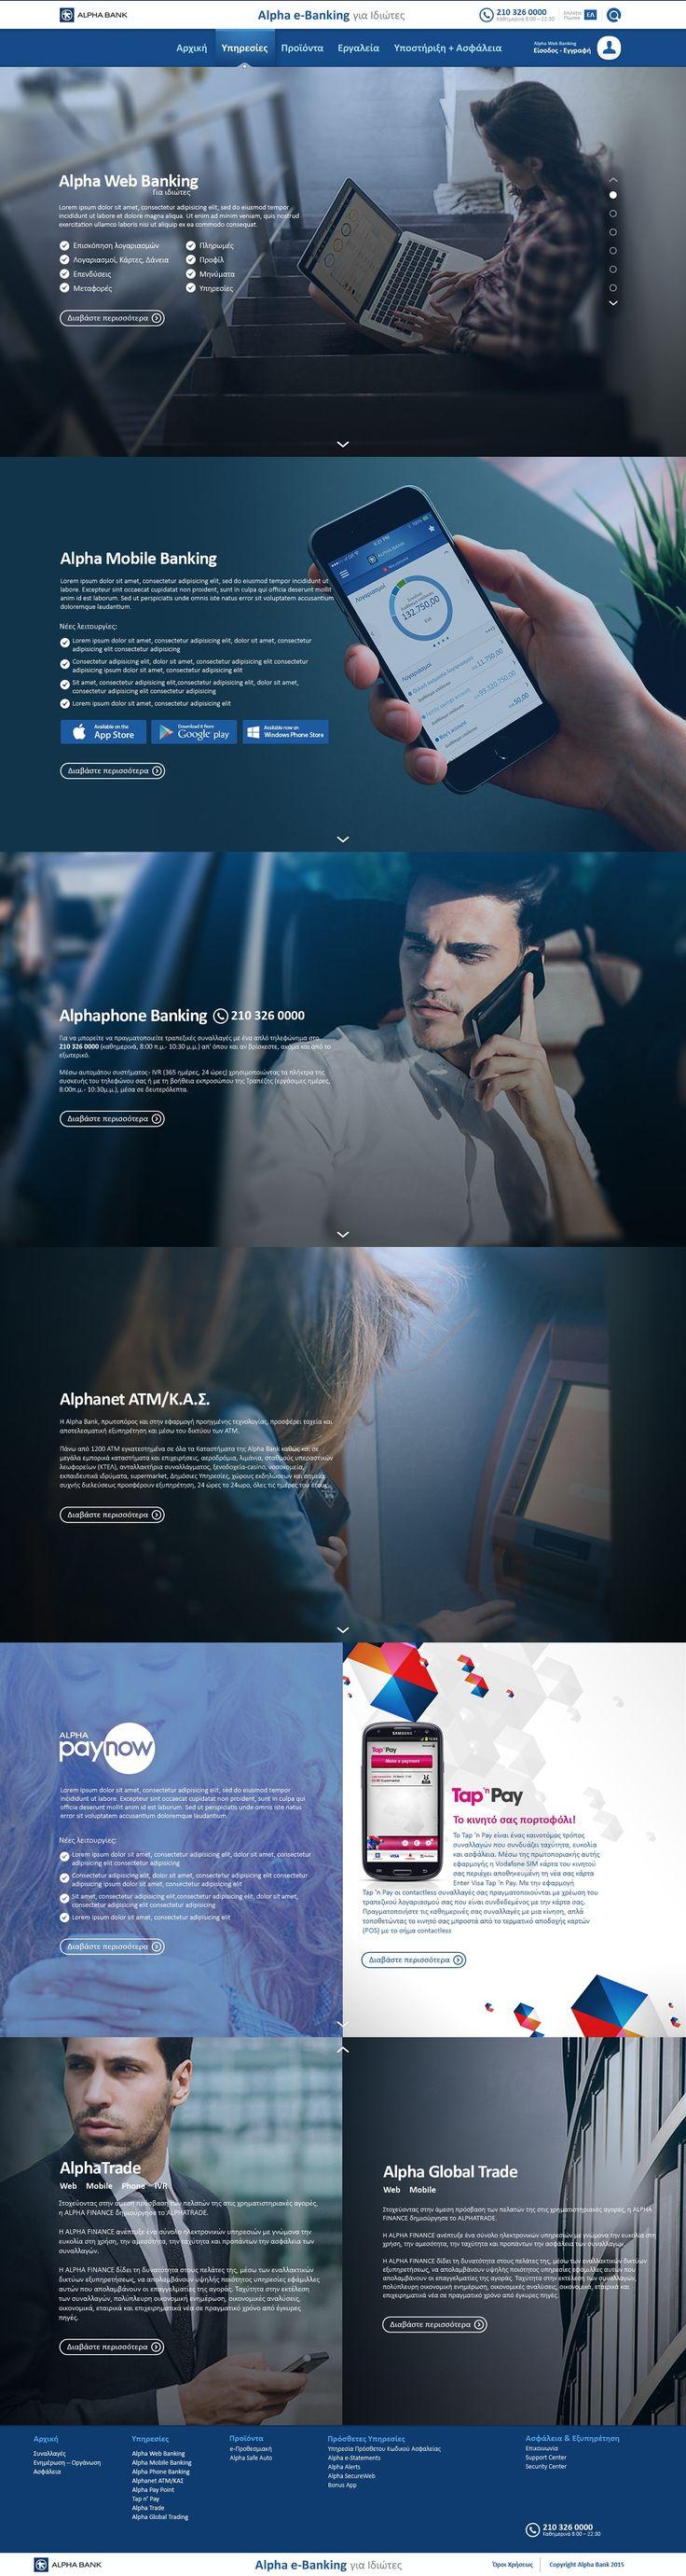 Alpha Bank : Alpha e-Banking prelogin website designs on Behance